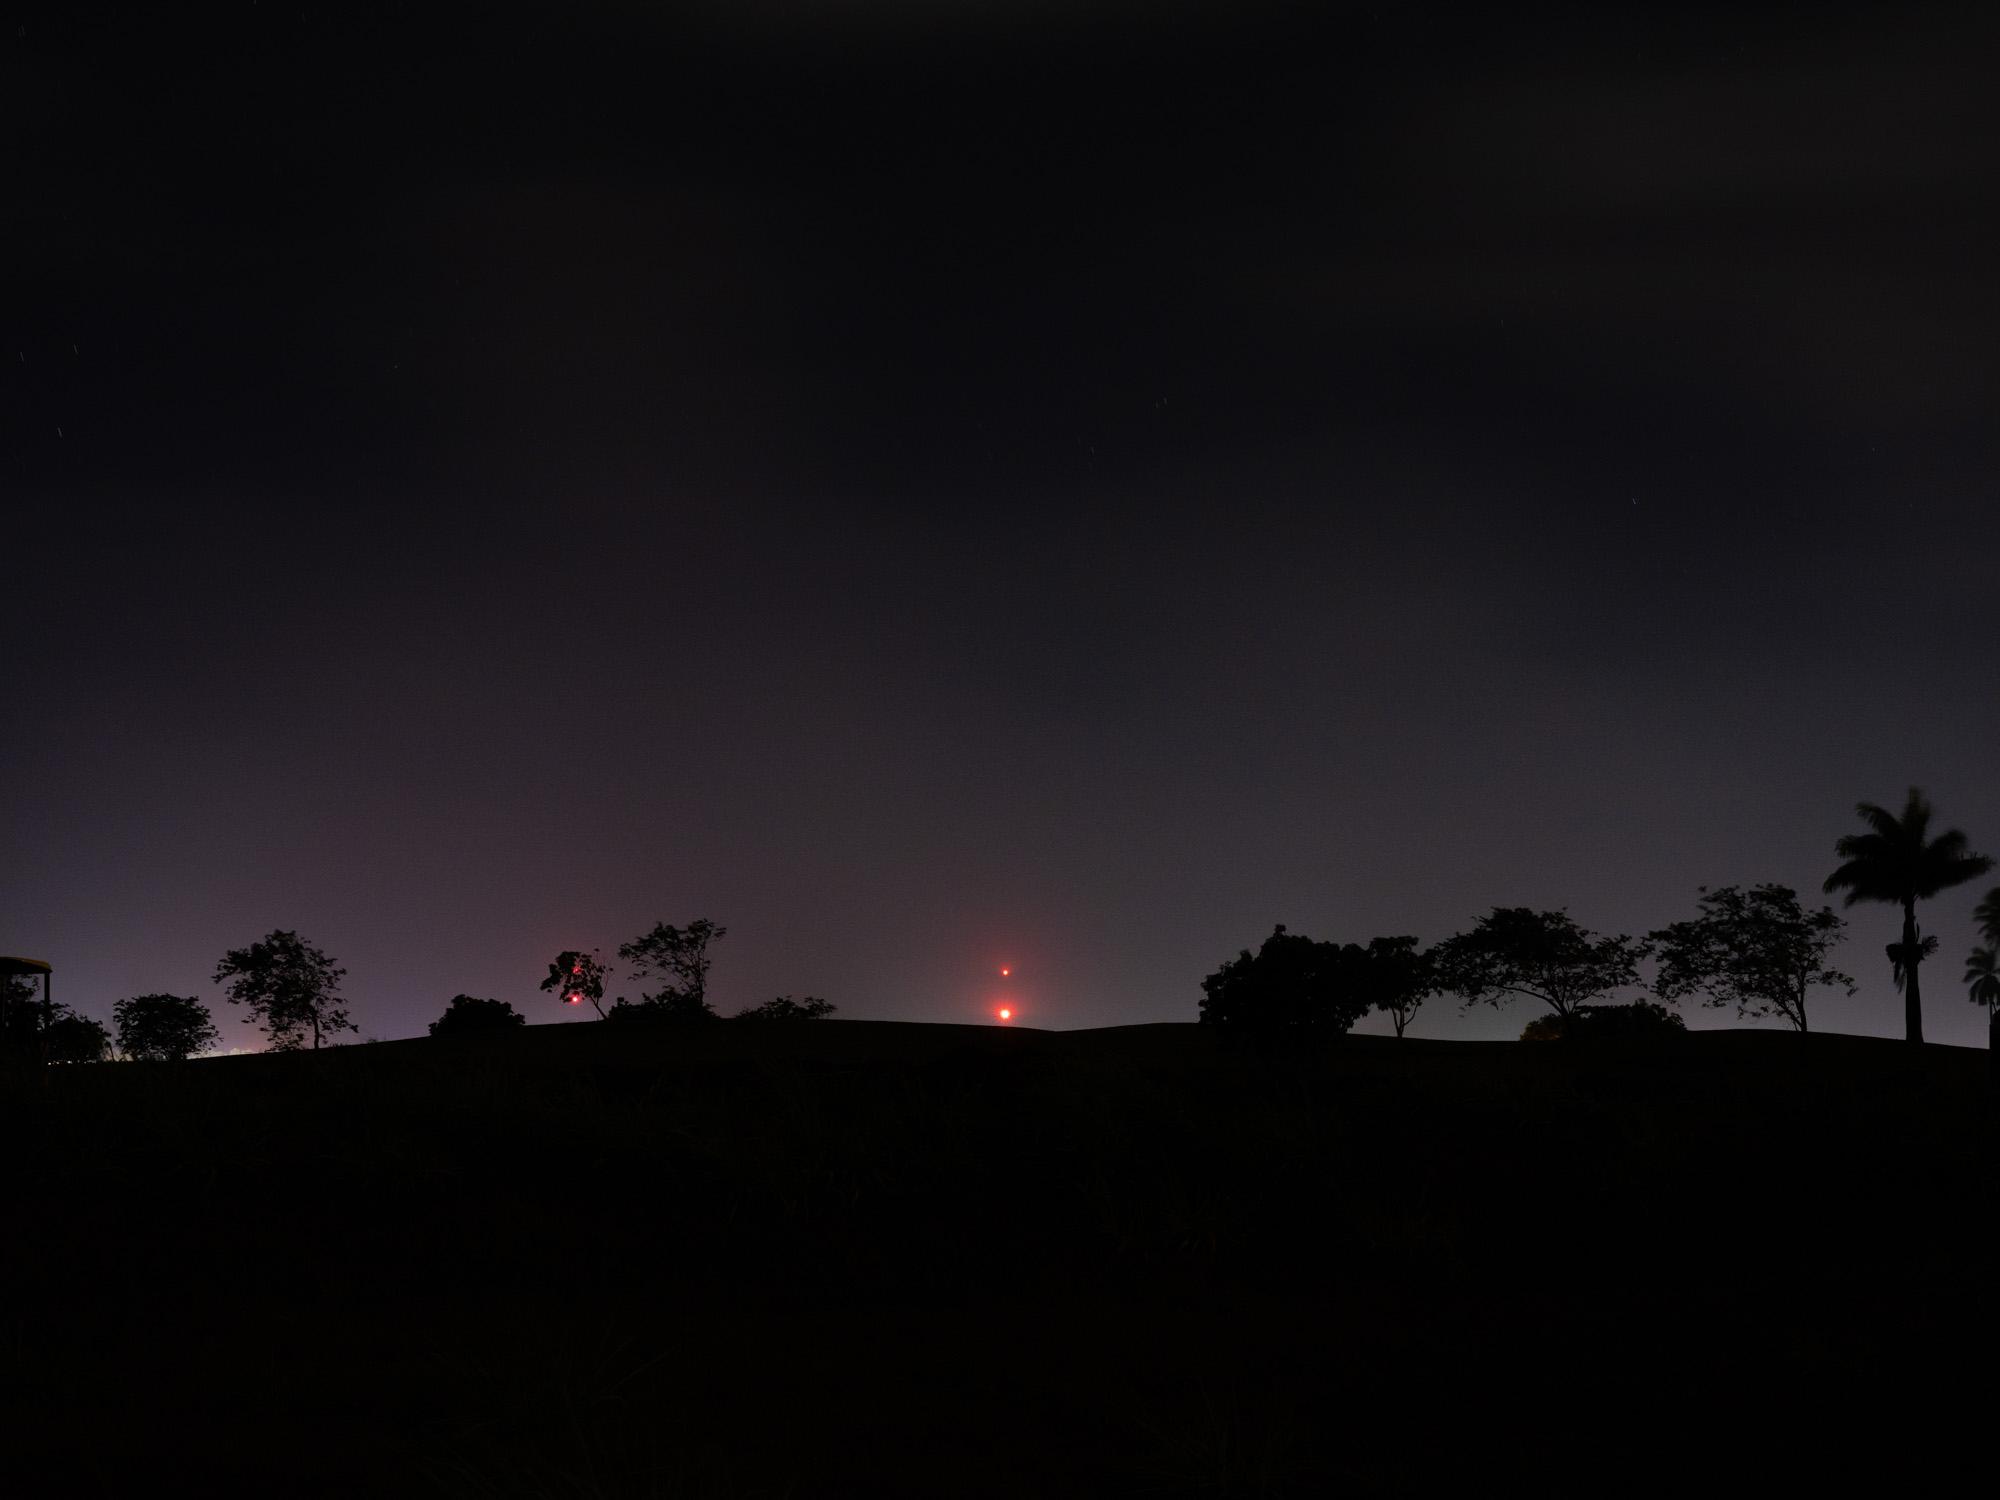 Nighttime image of landscape.